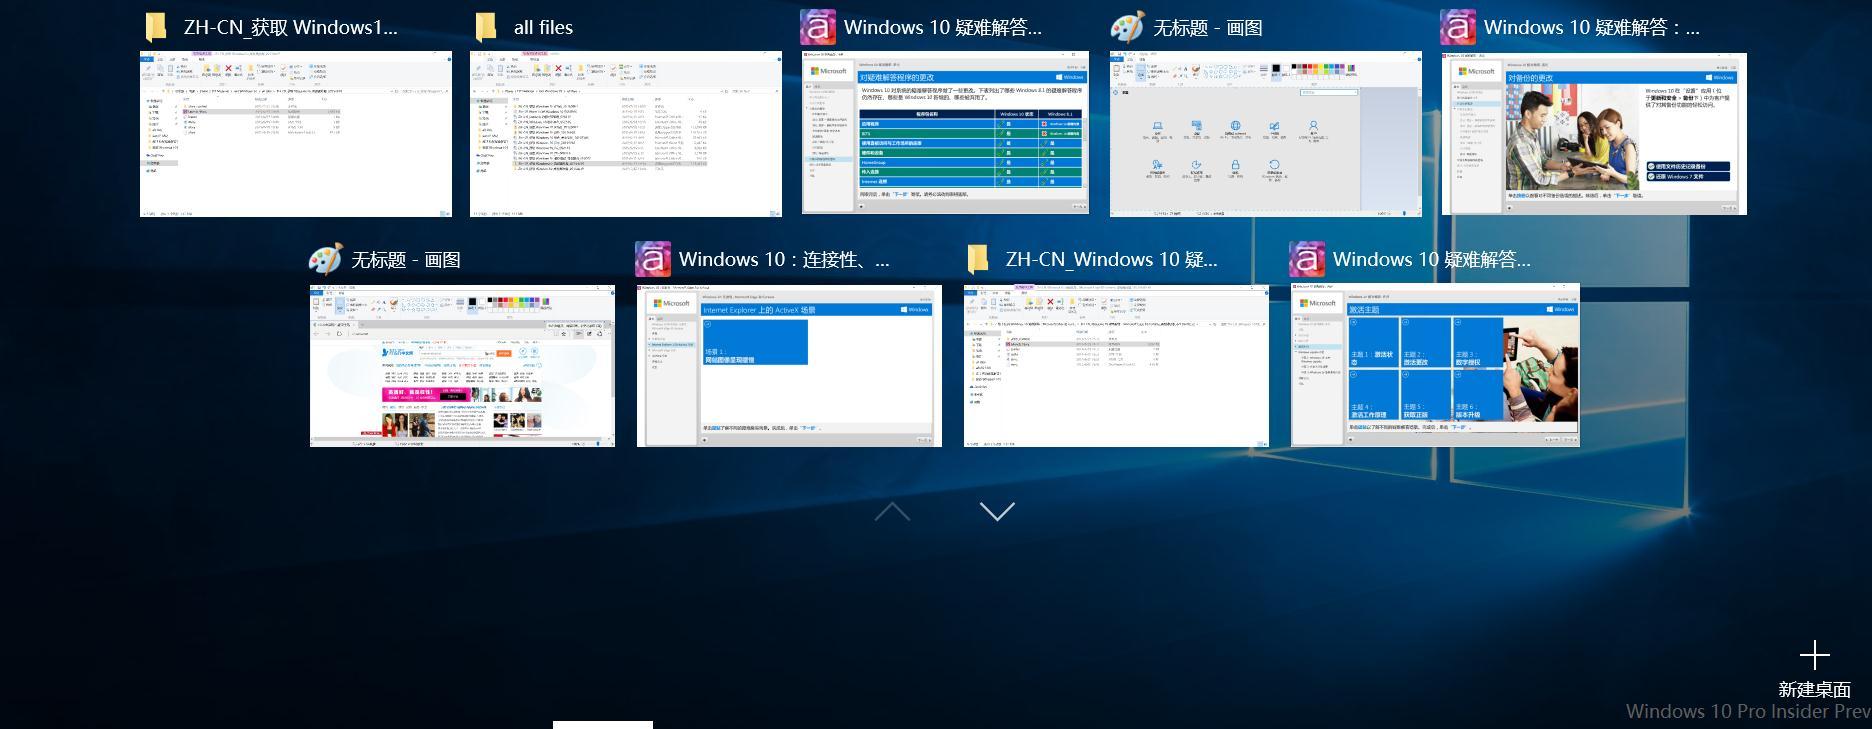 windows 10 多任务和虚拟桌面